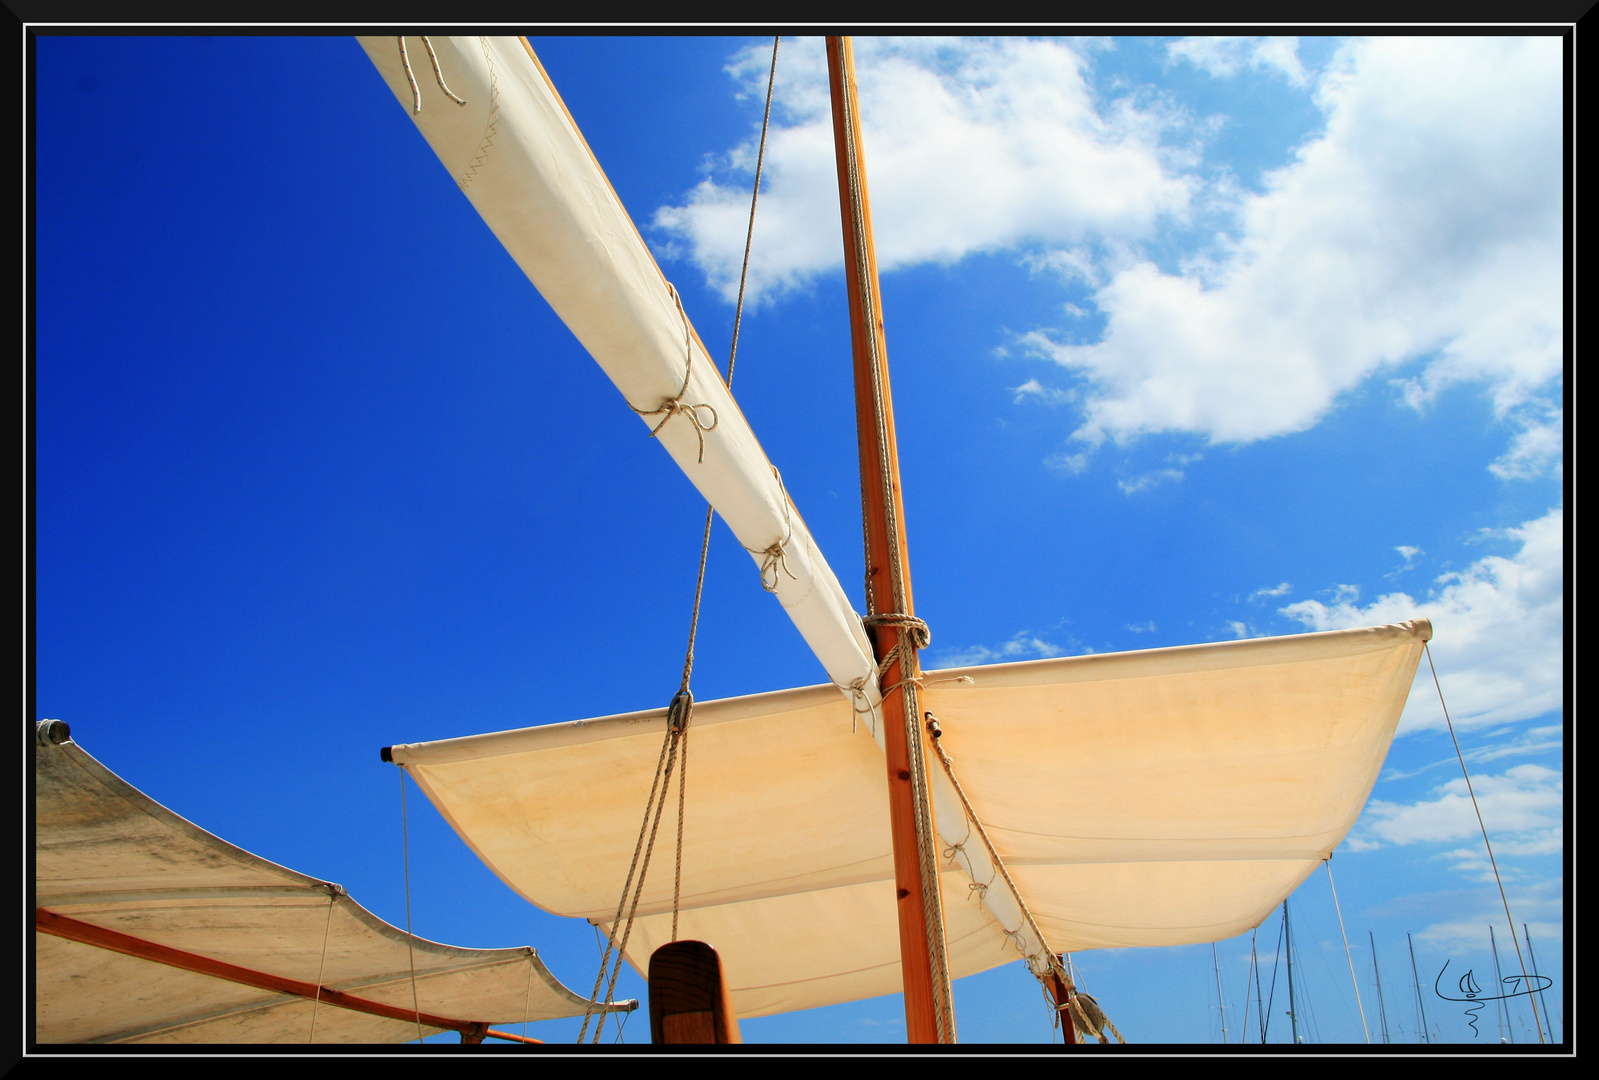 Barques Majorcaises